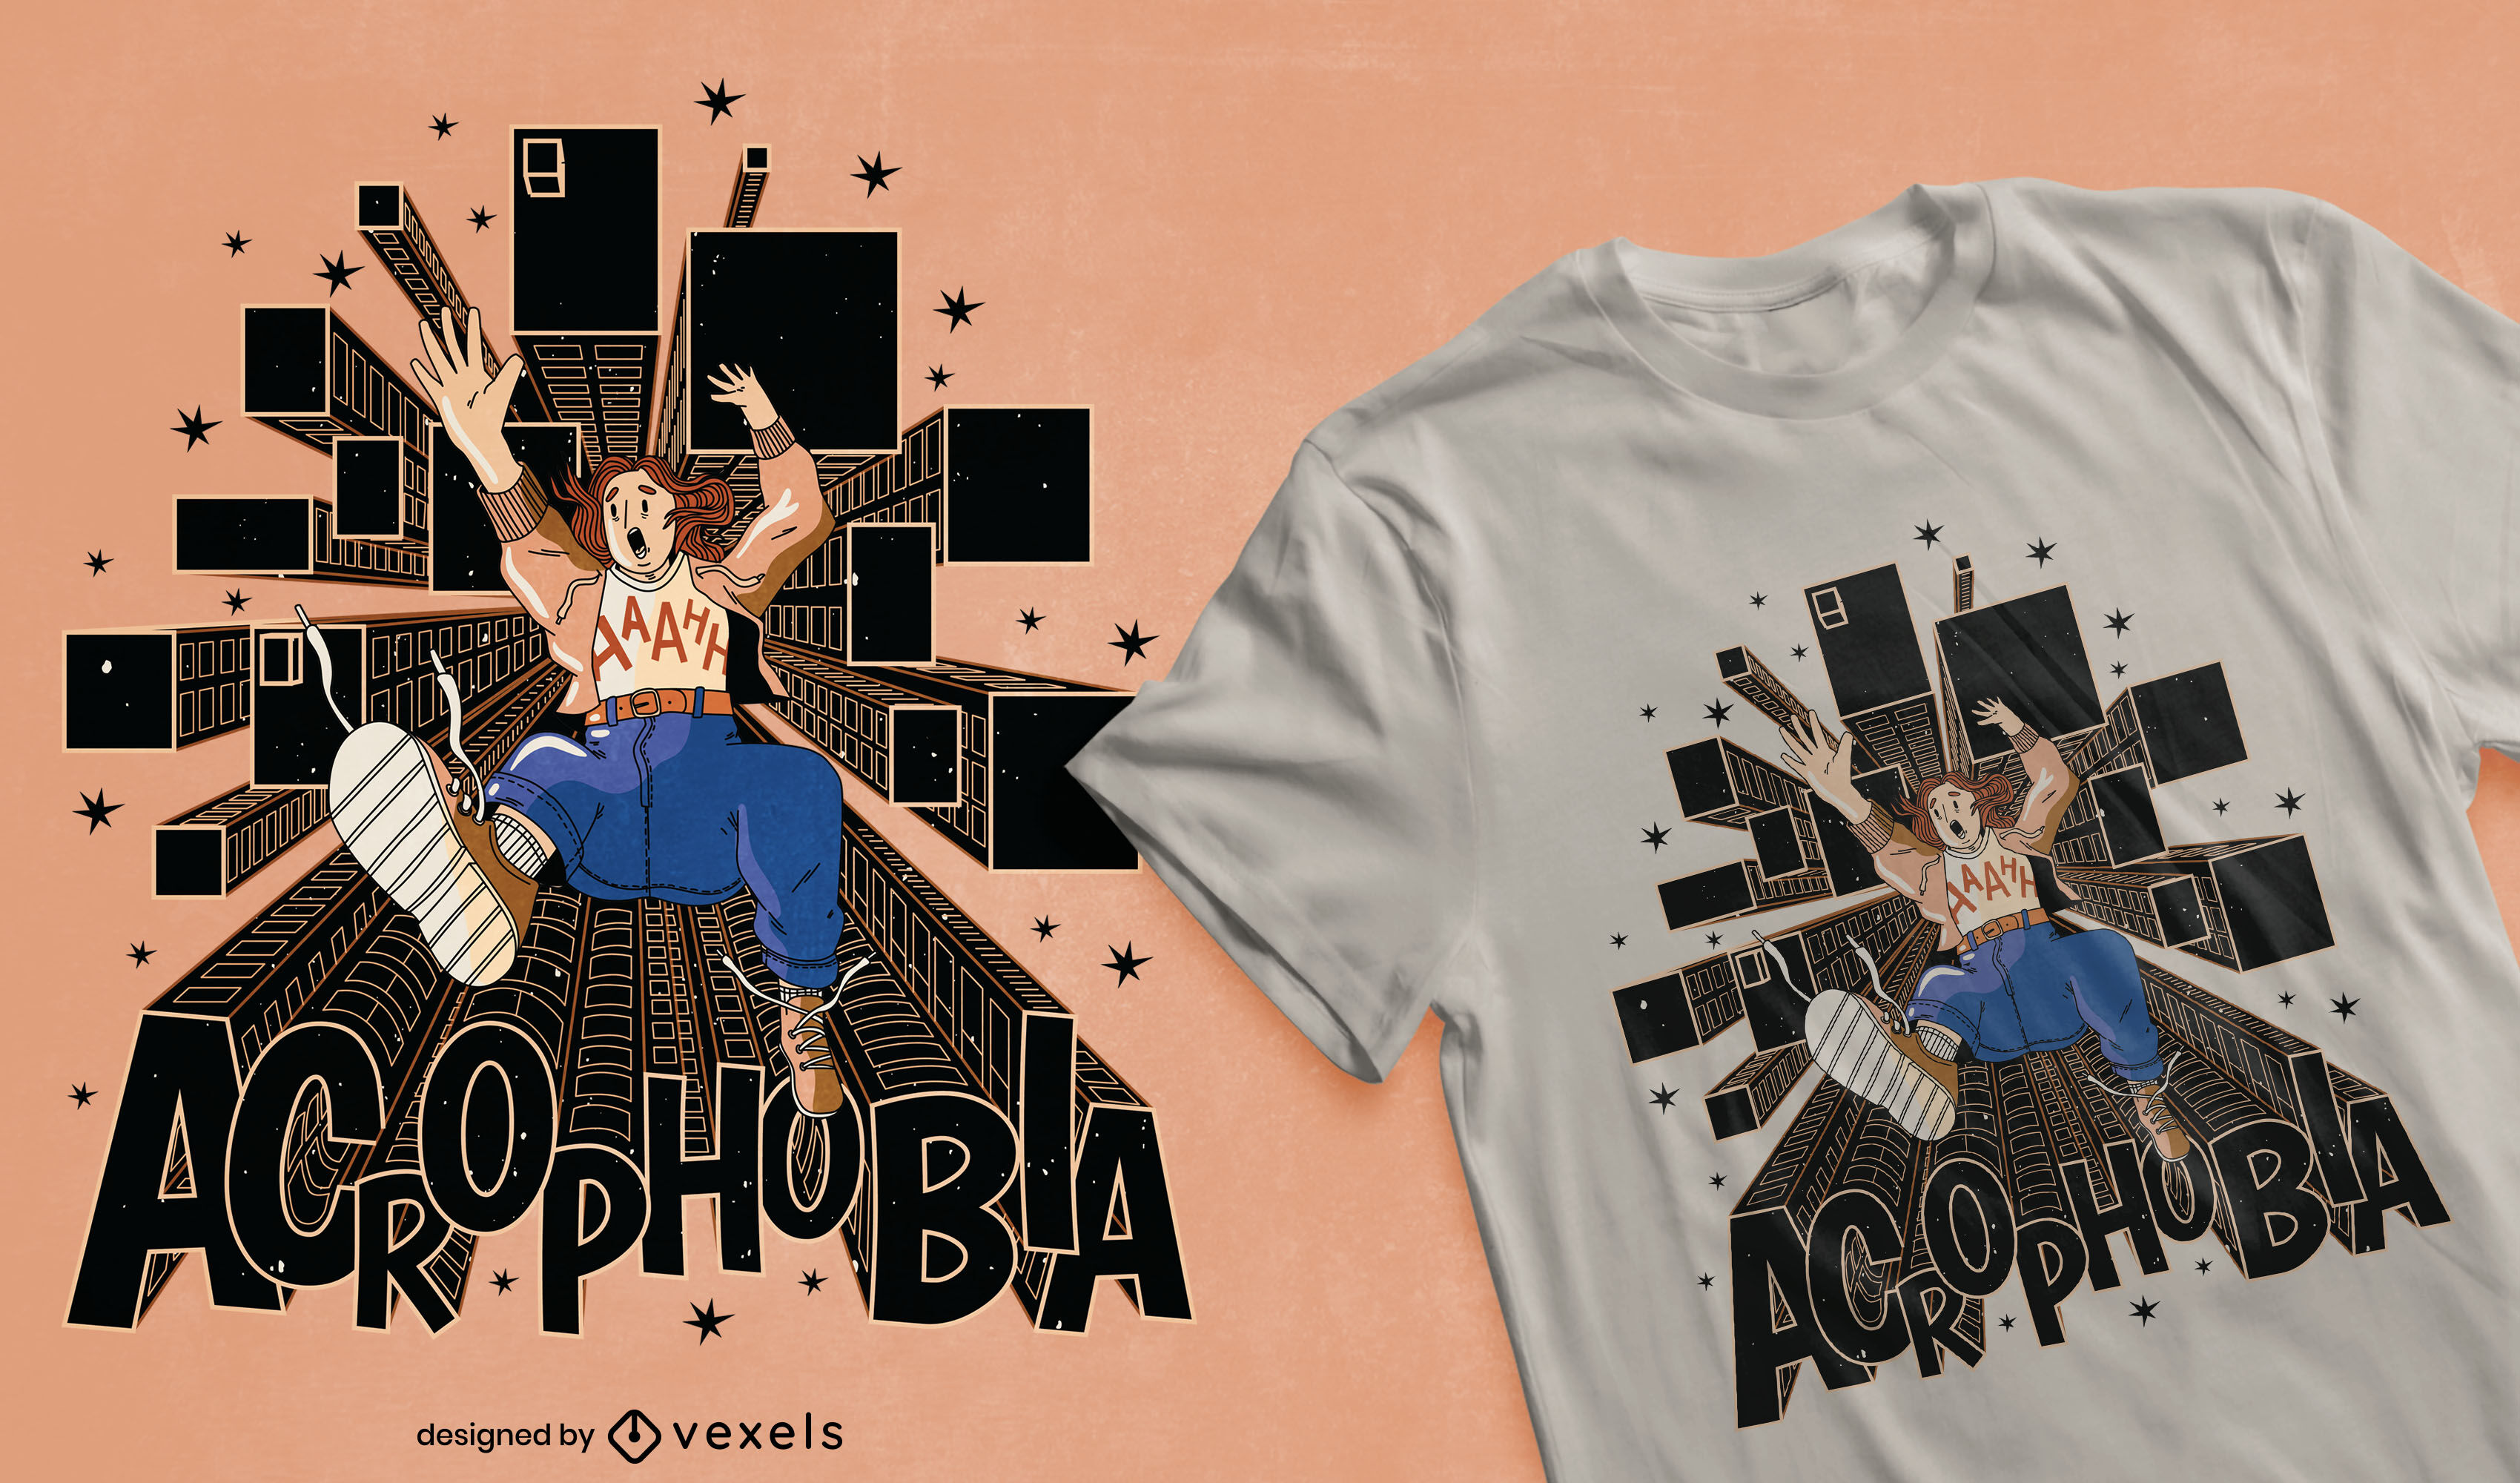 Cool acrophobia t-shirt design